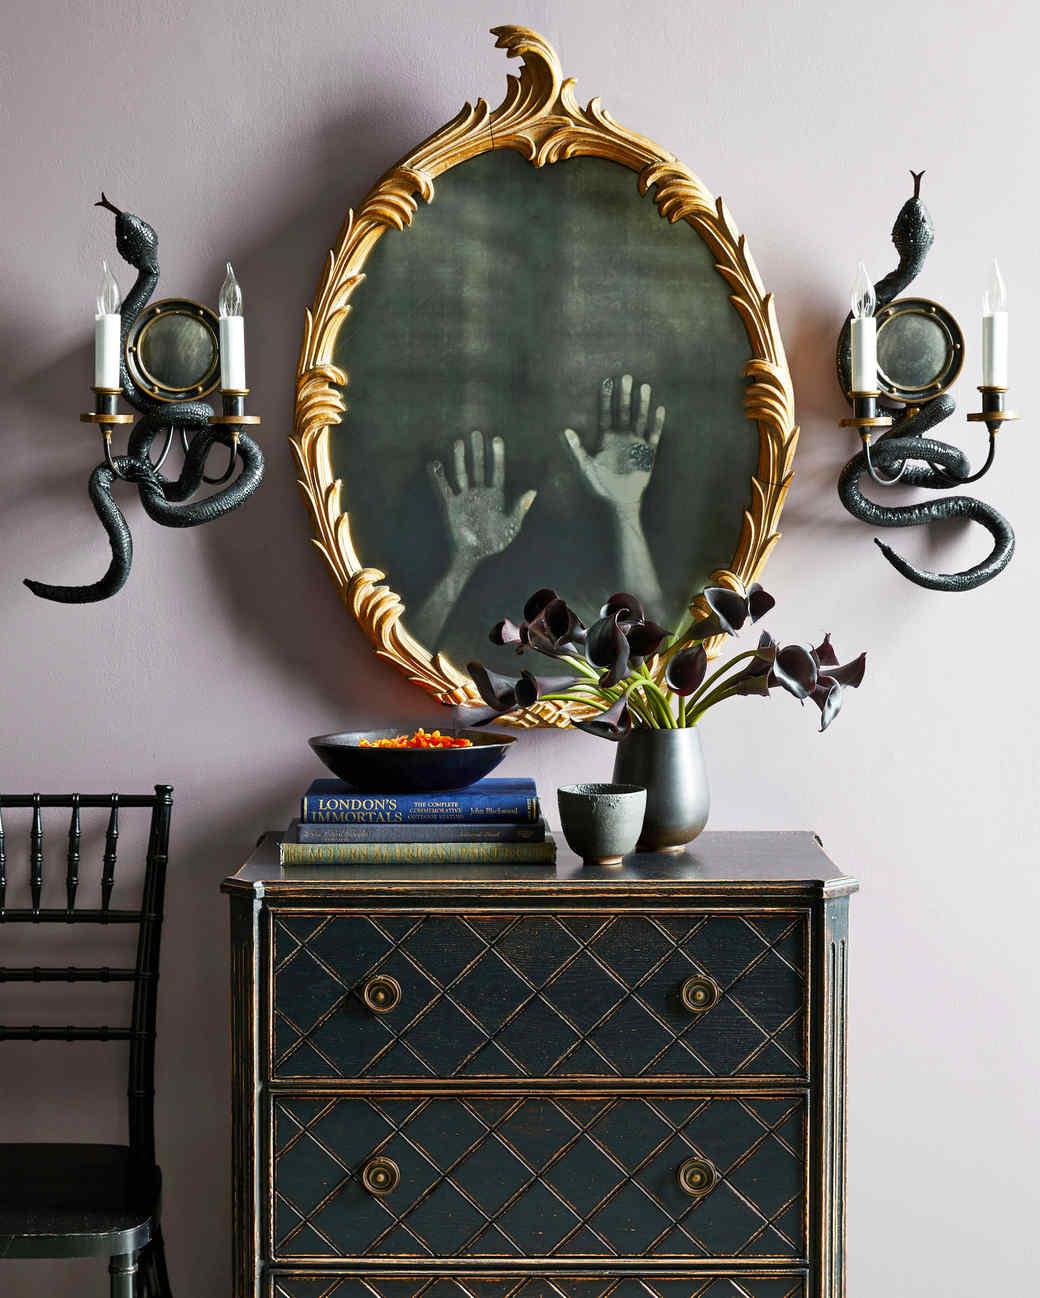 Merveilleux Haunted Mirror Hands